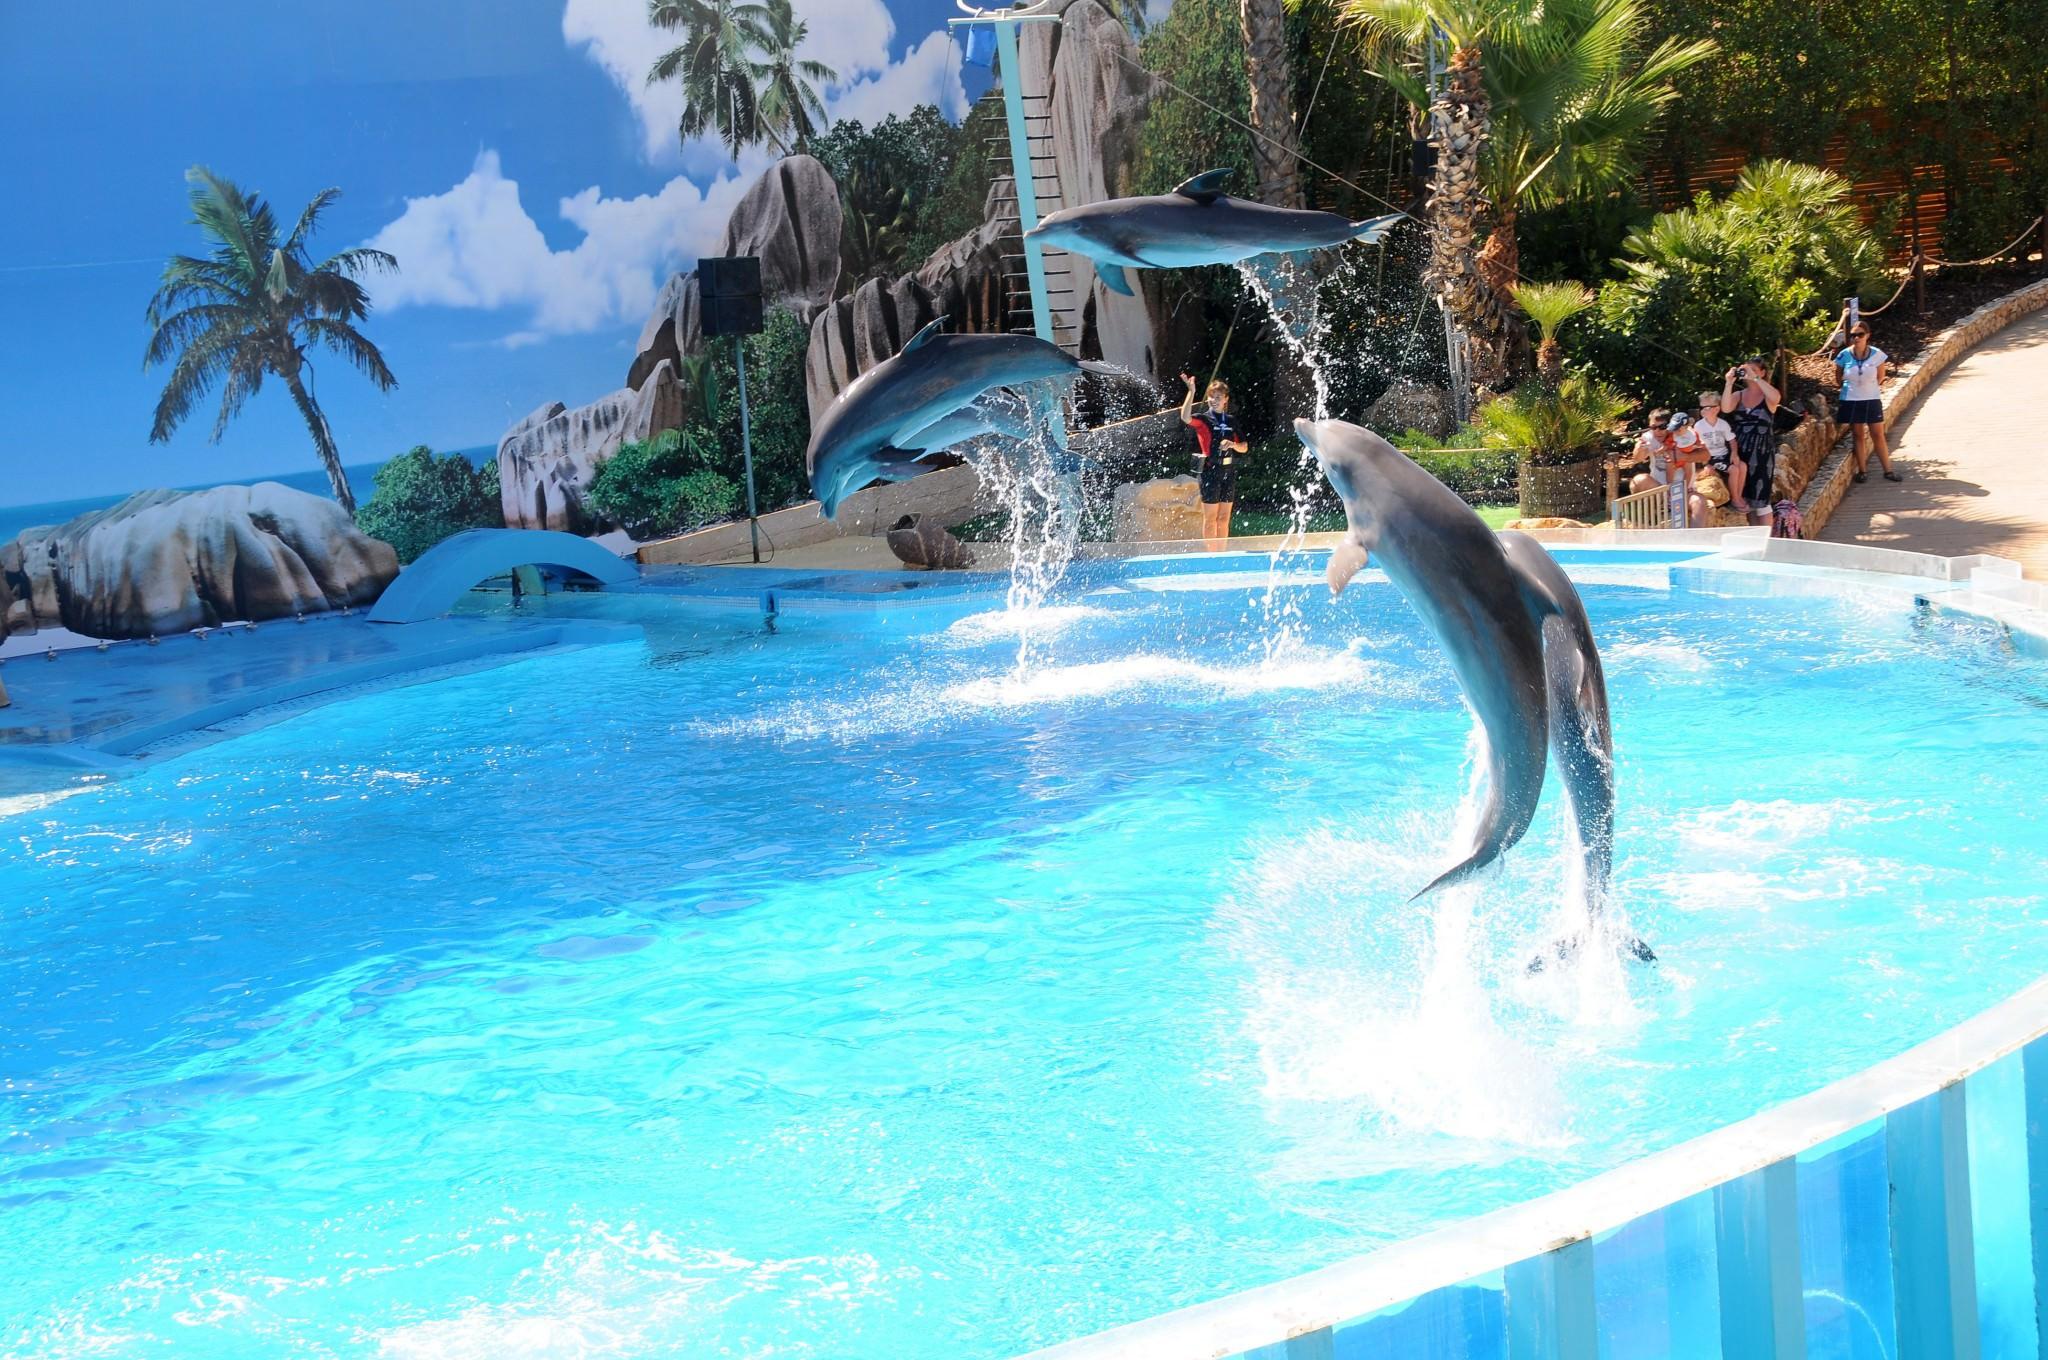 Long Term Car Rental >> Zoomarine Aquatic Theme Park ・ Praia da Luz Holidays